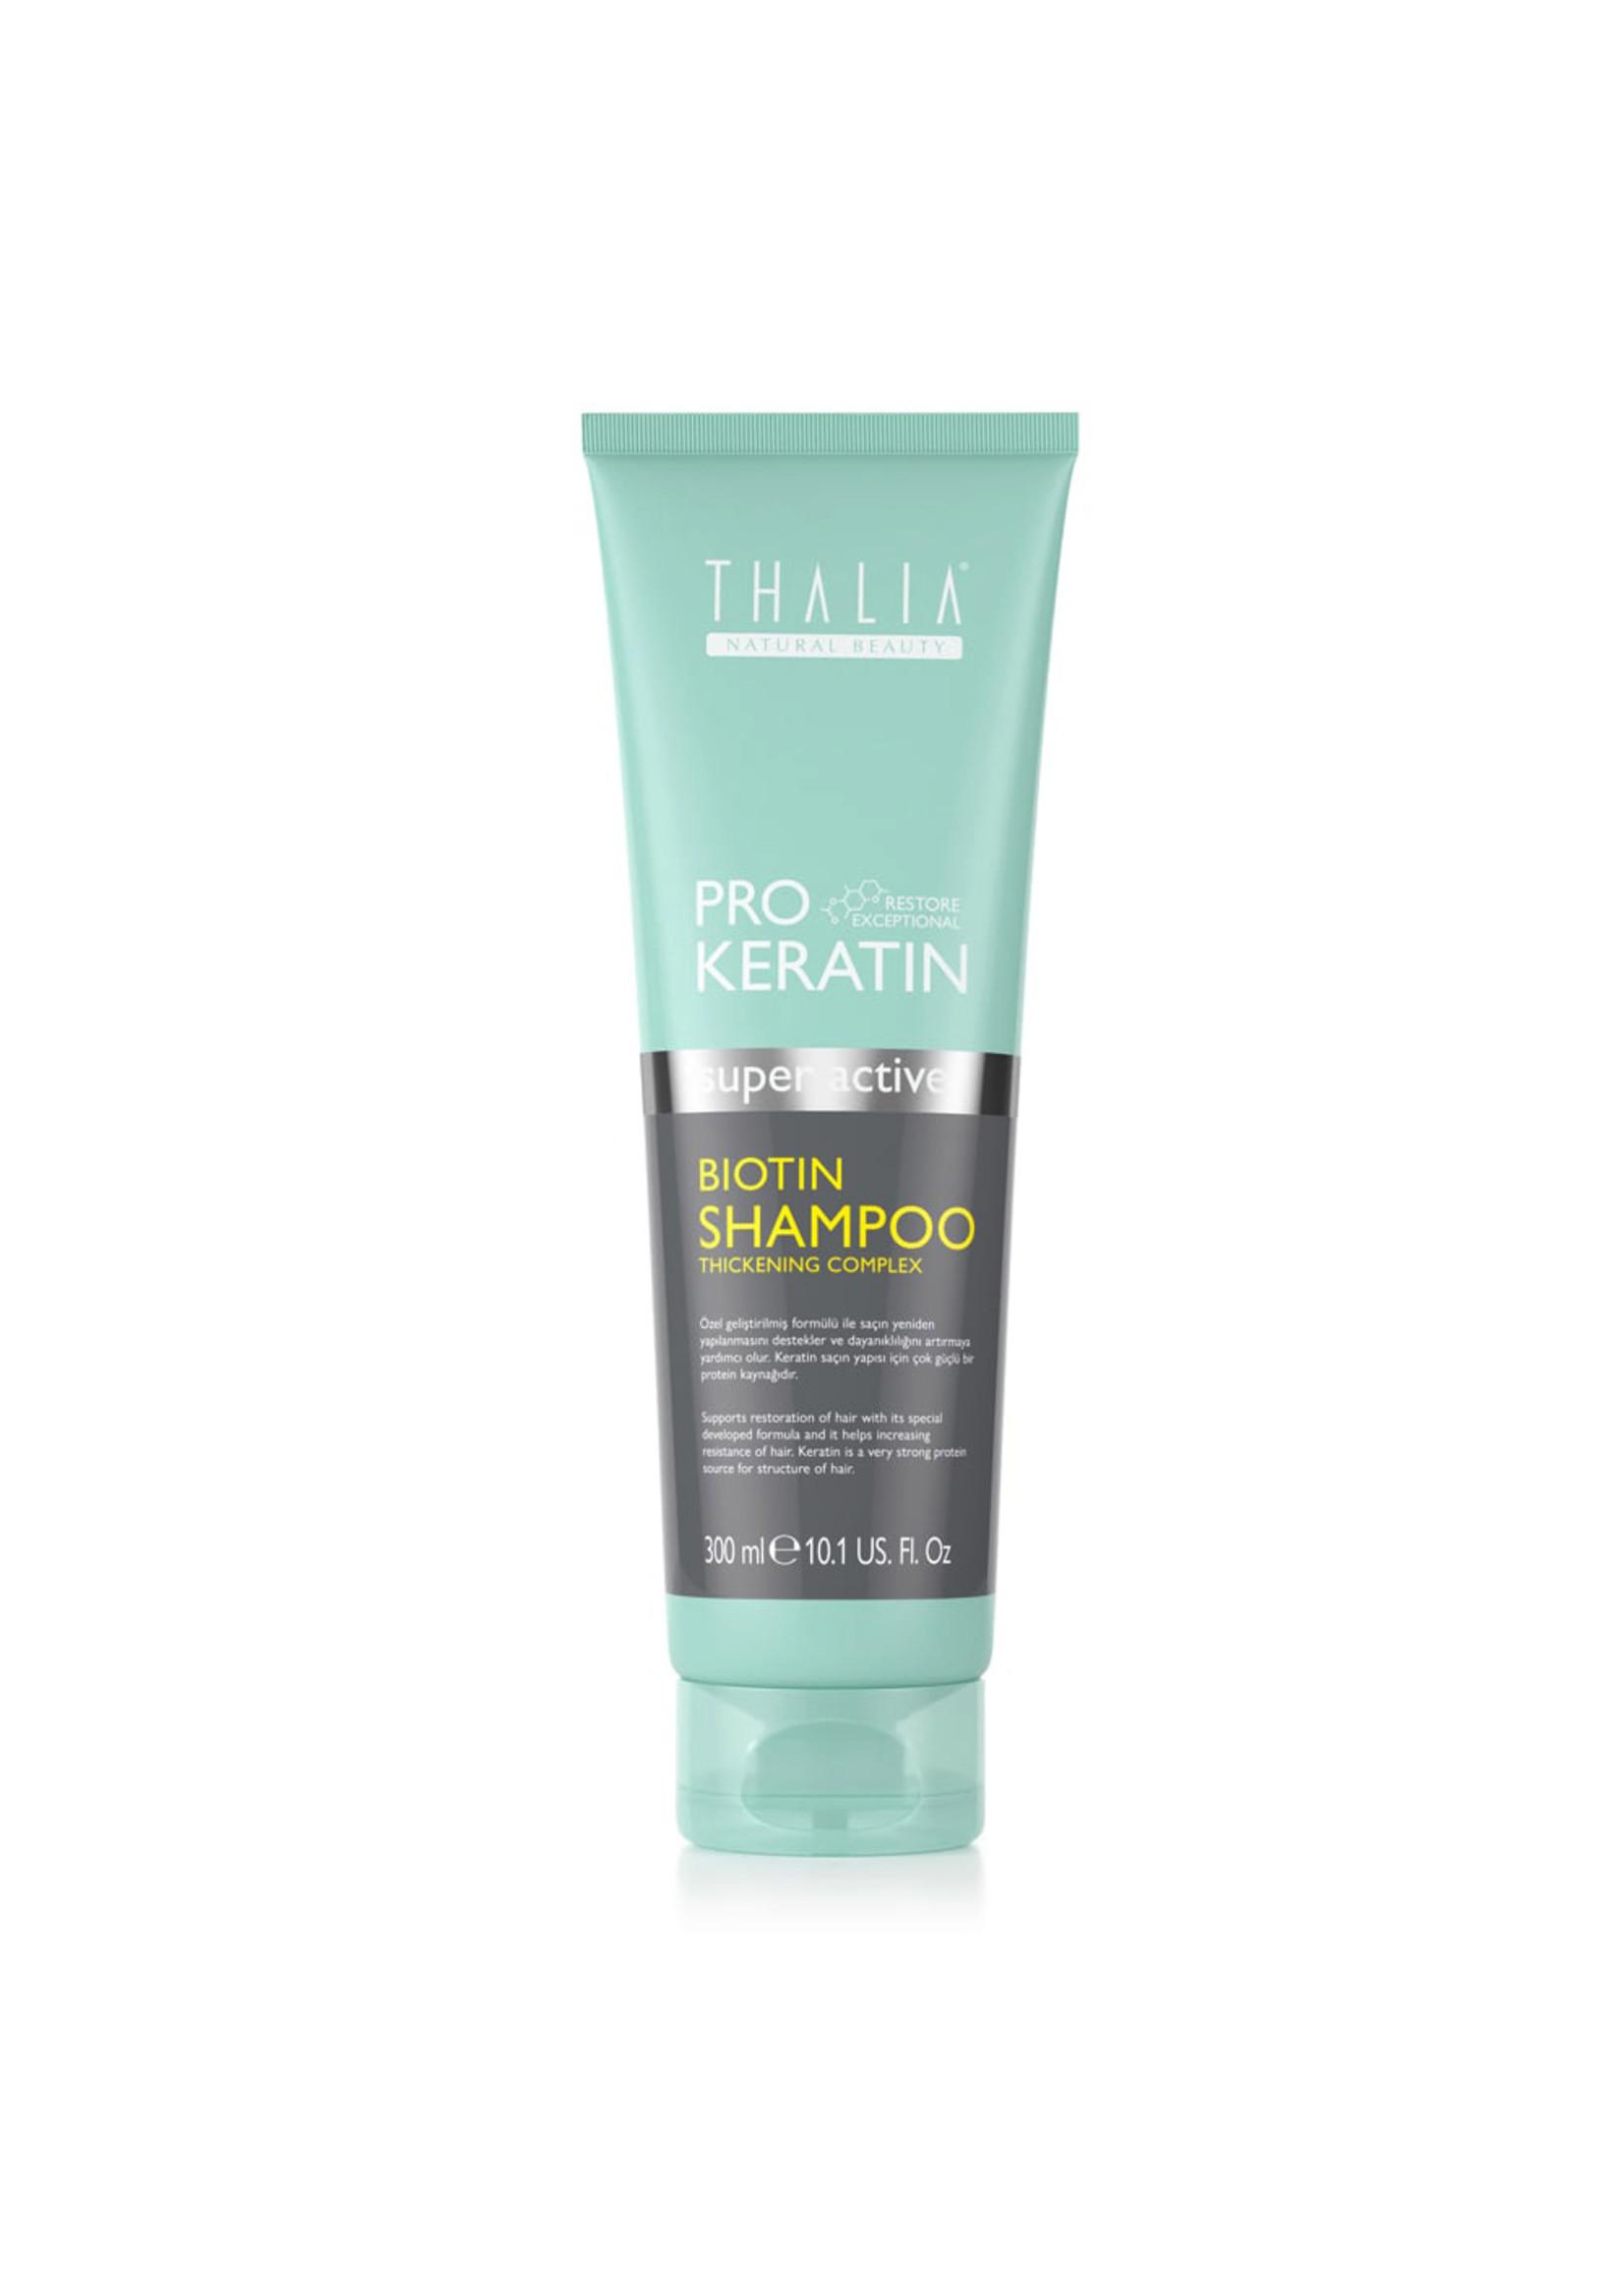 Thalia Pro Keratine Biotine Shampoo - 300 ml